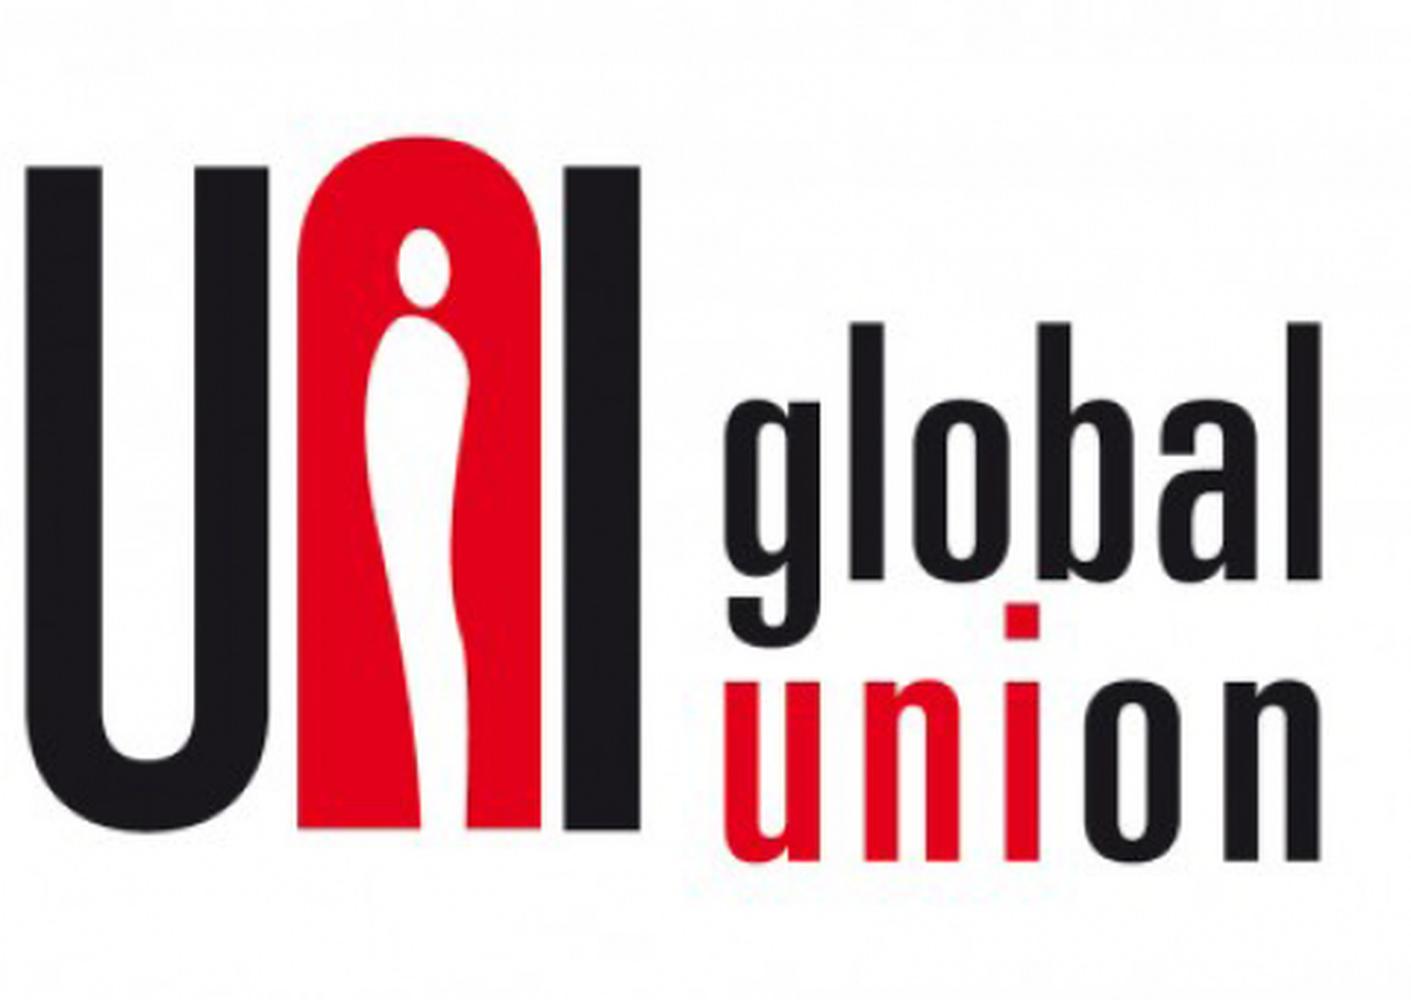 ver.di – Metro muss Beschäftigtenrechte respektieren! Uninor Logo Png